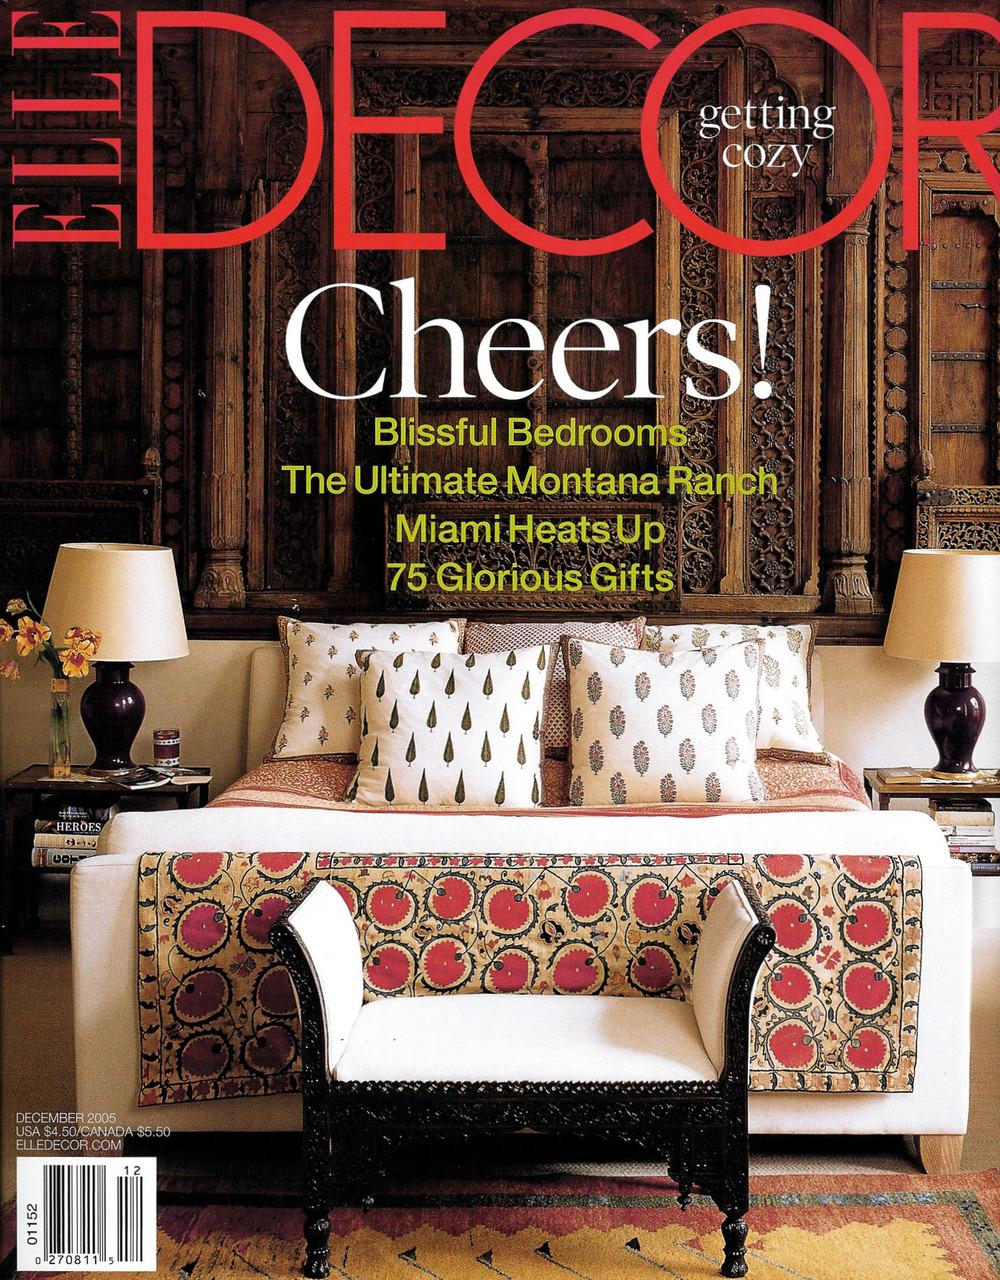 Elle Decor Dec 2005 Cover.jpg